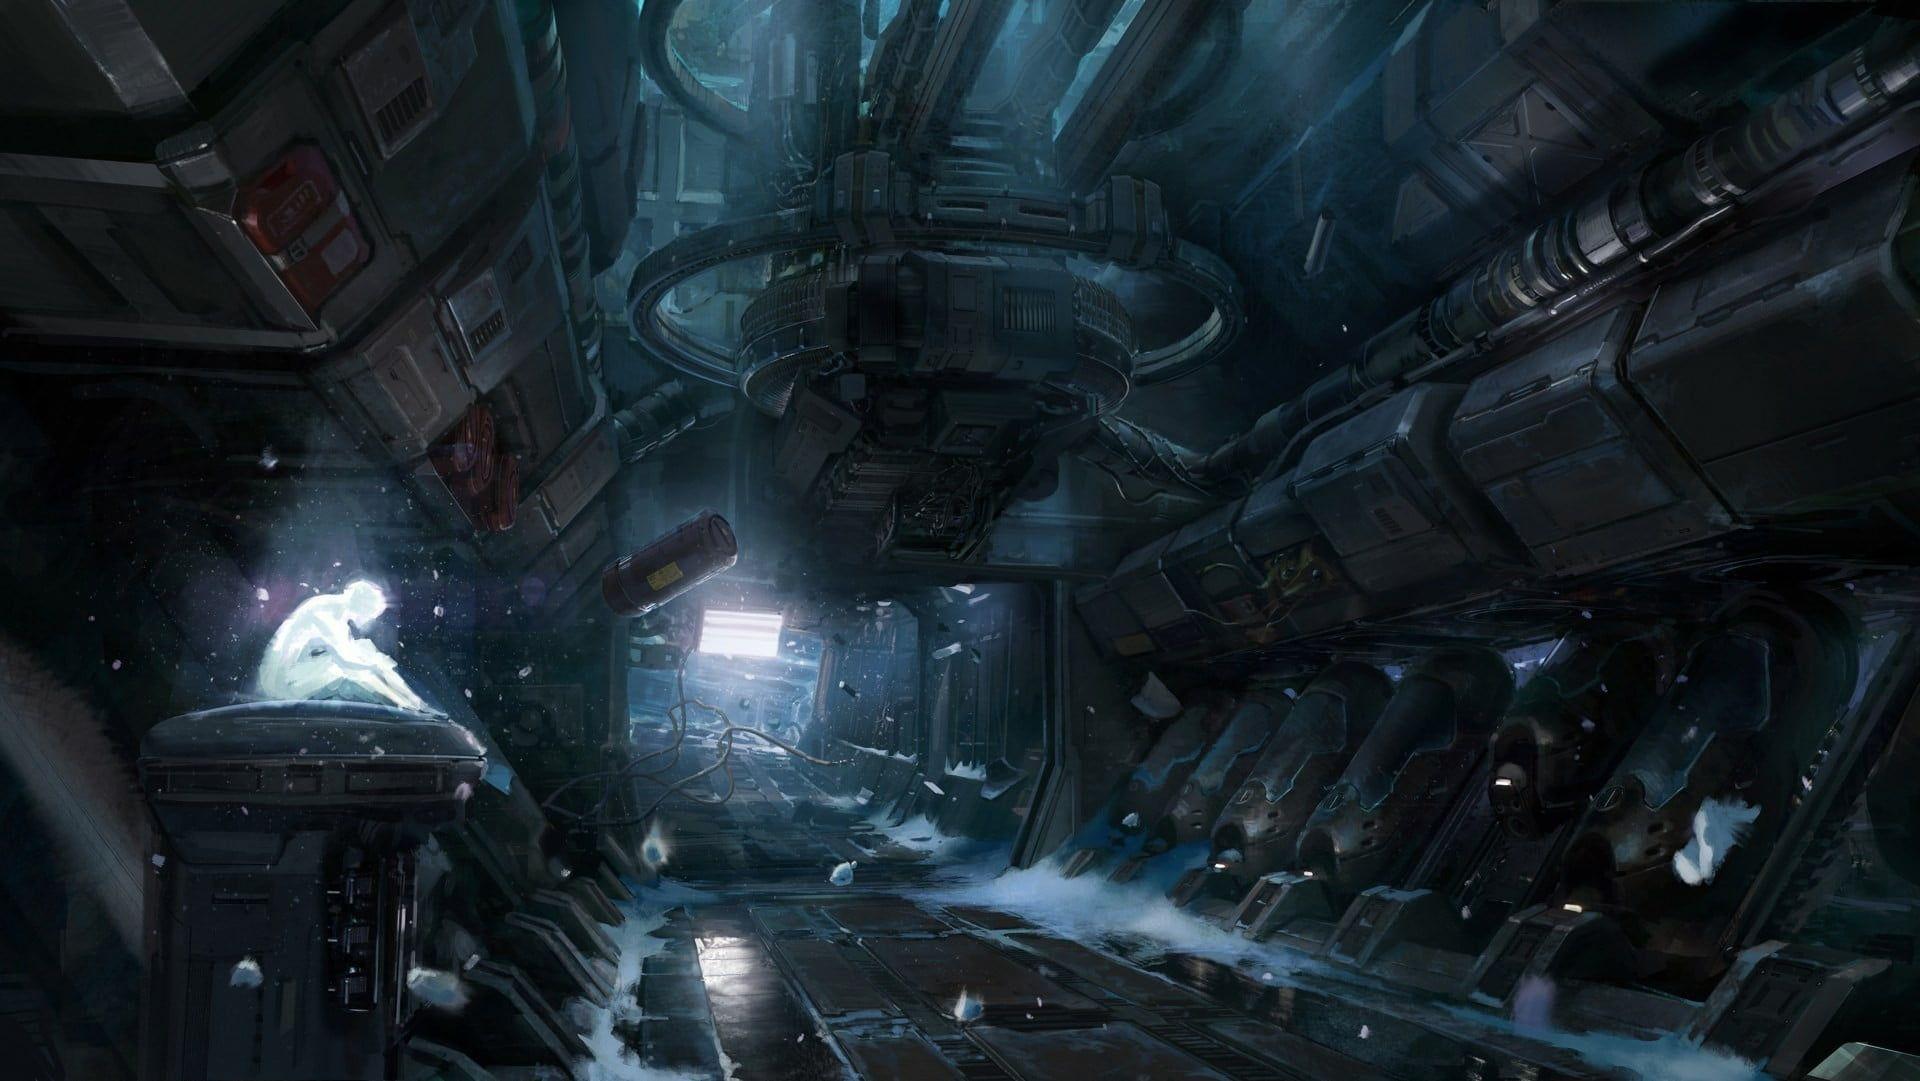 Gray Spaceship Interior Wallpaper Halo Halo 4 Cortana Concept Art Video Games 1080p Wallpaper Hdwallpaper Desktop